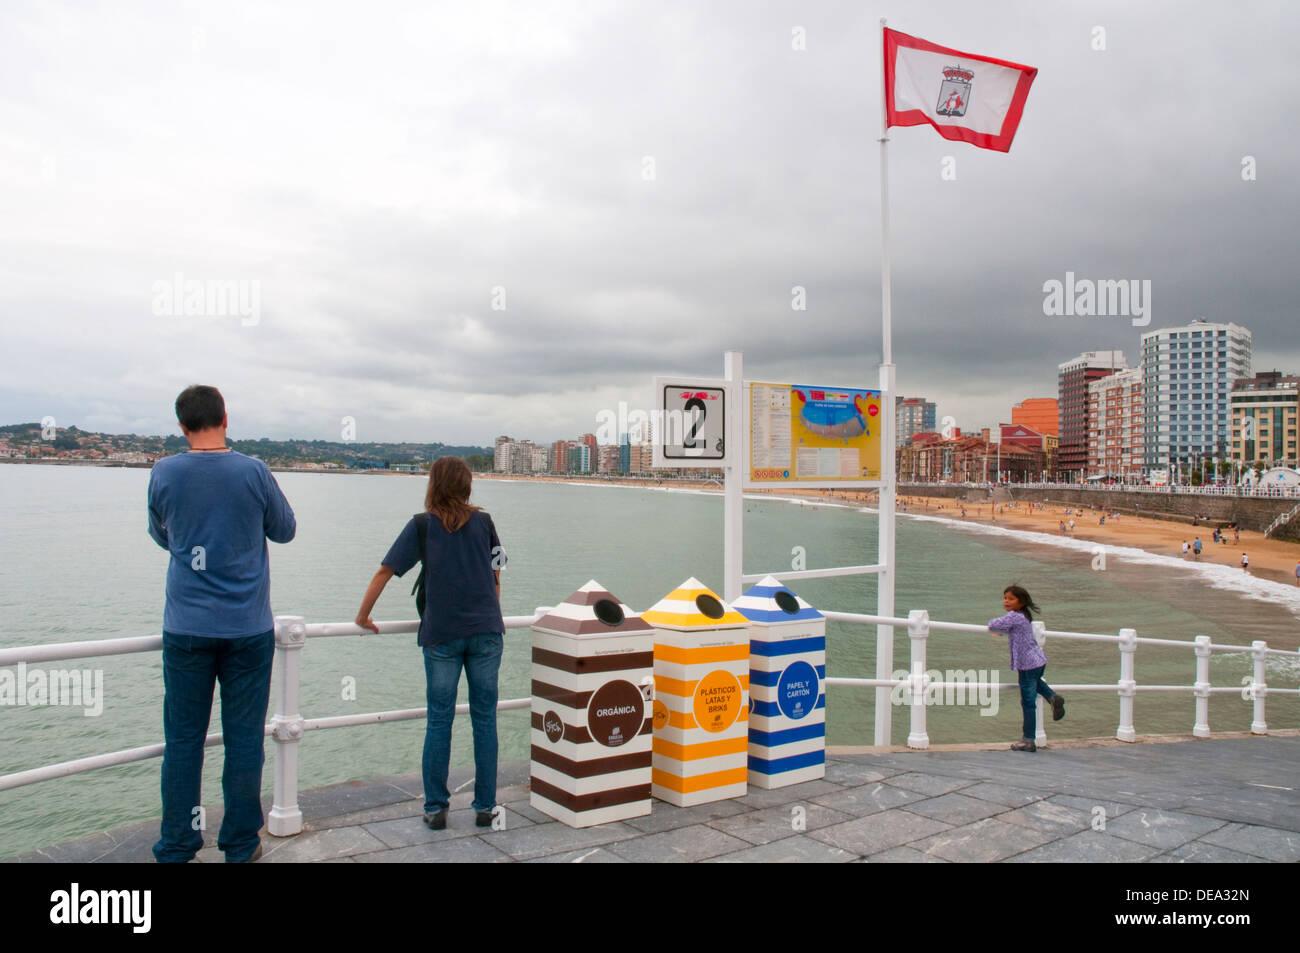 Familia en el paseo marítimo. Playa de San Lorenzo, Gijon, Asturias, España. Imagen De Stock